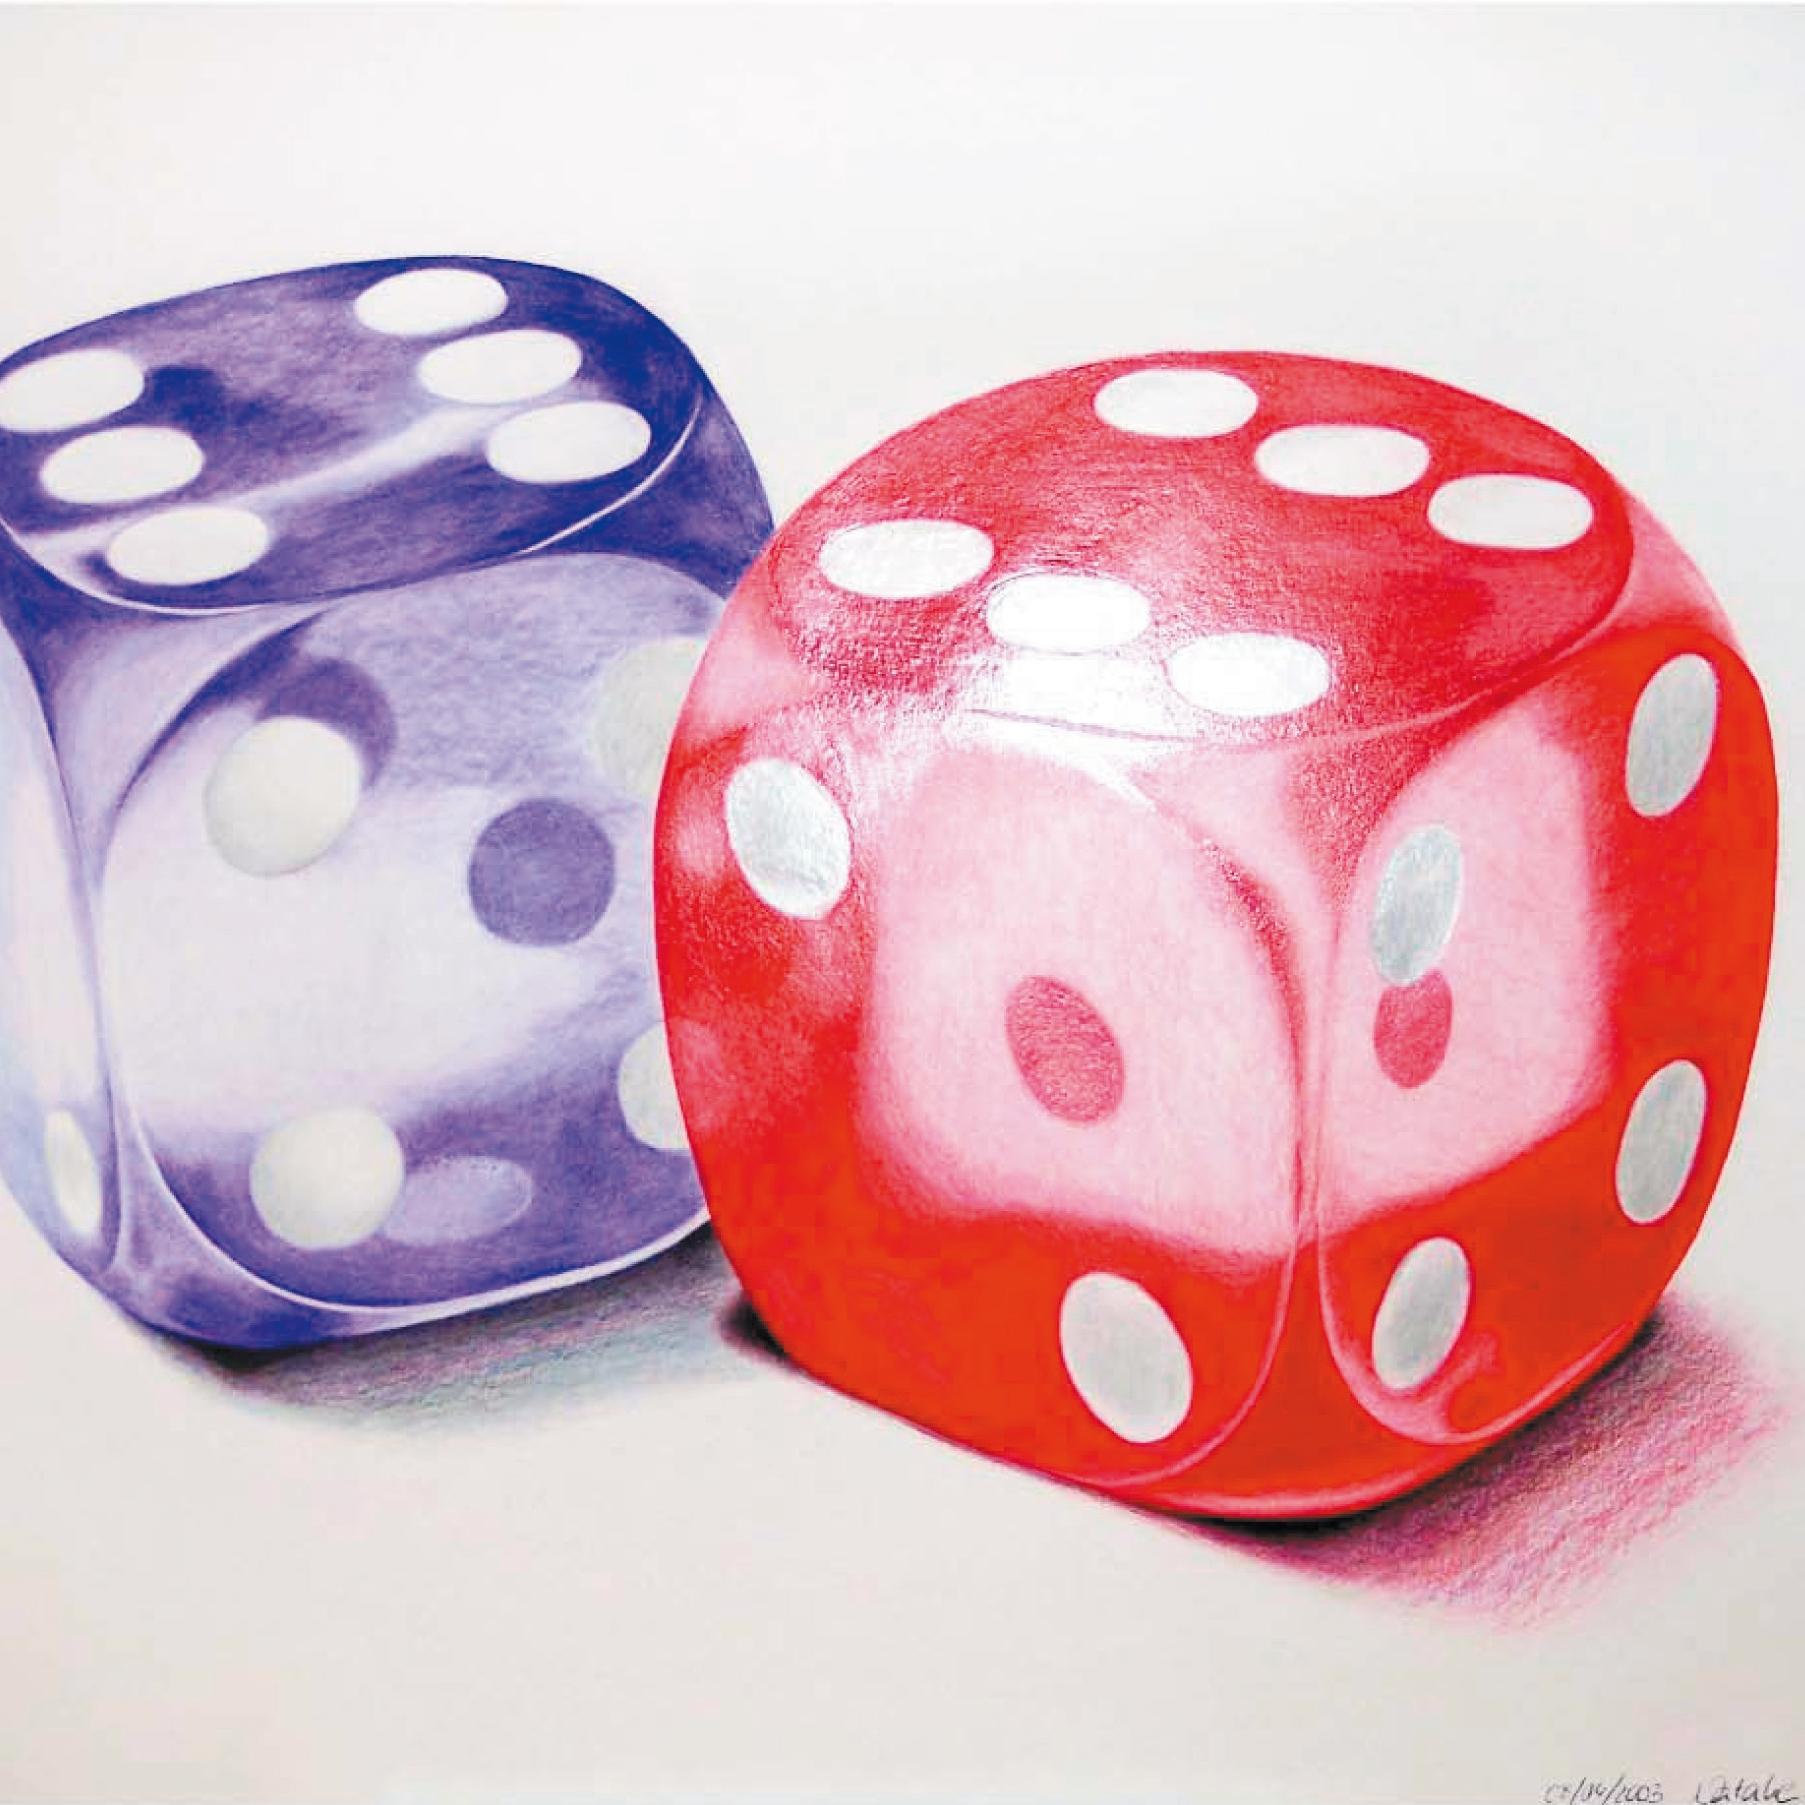 Zeichnung mit Polychromos: Zwei Glaswürfel